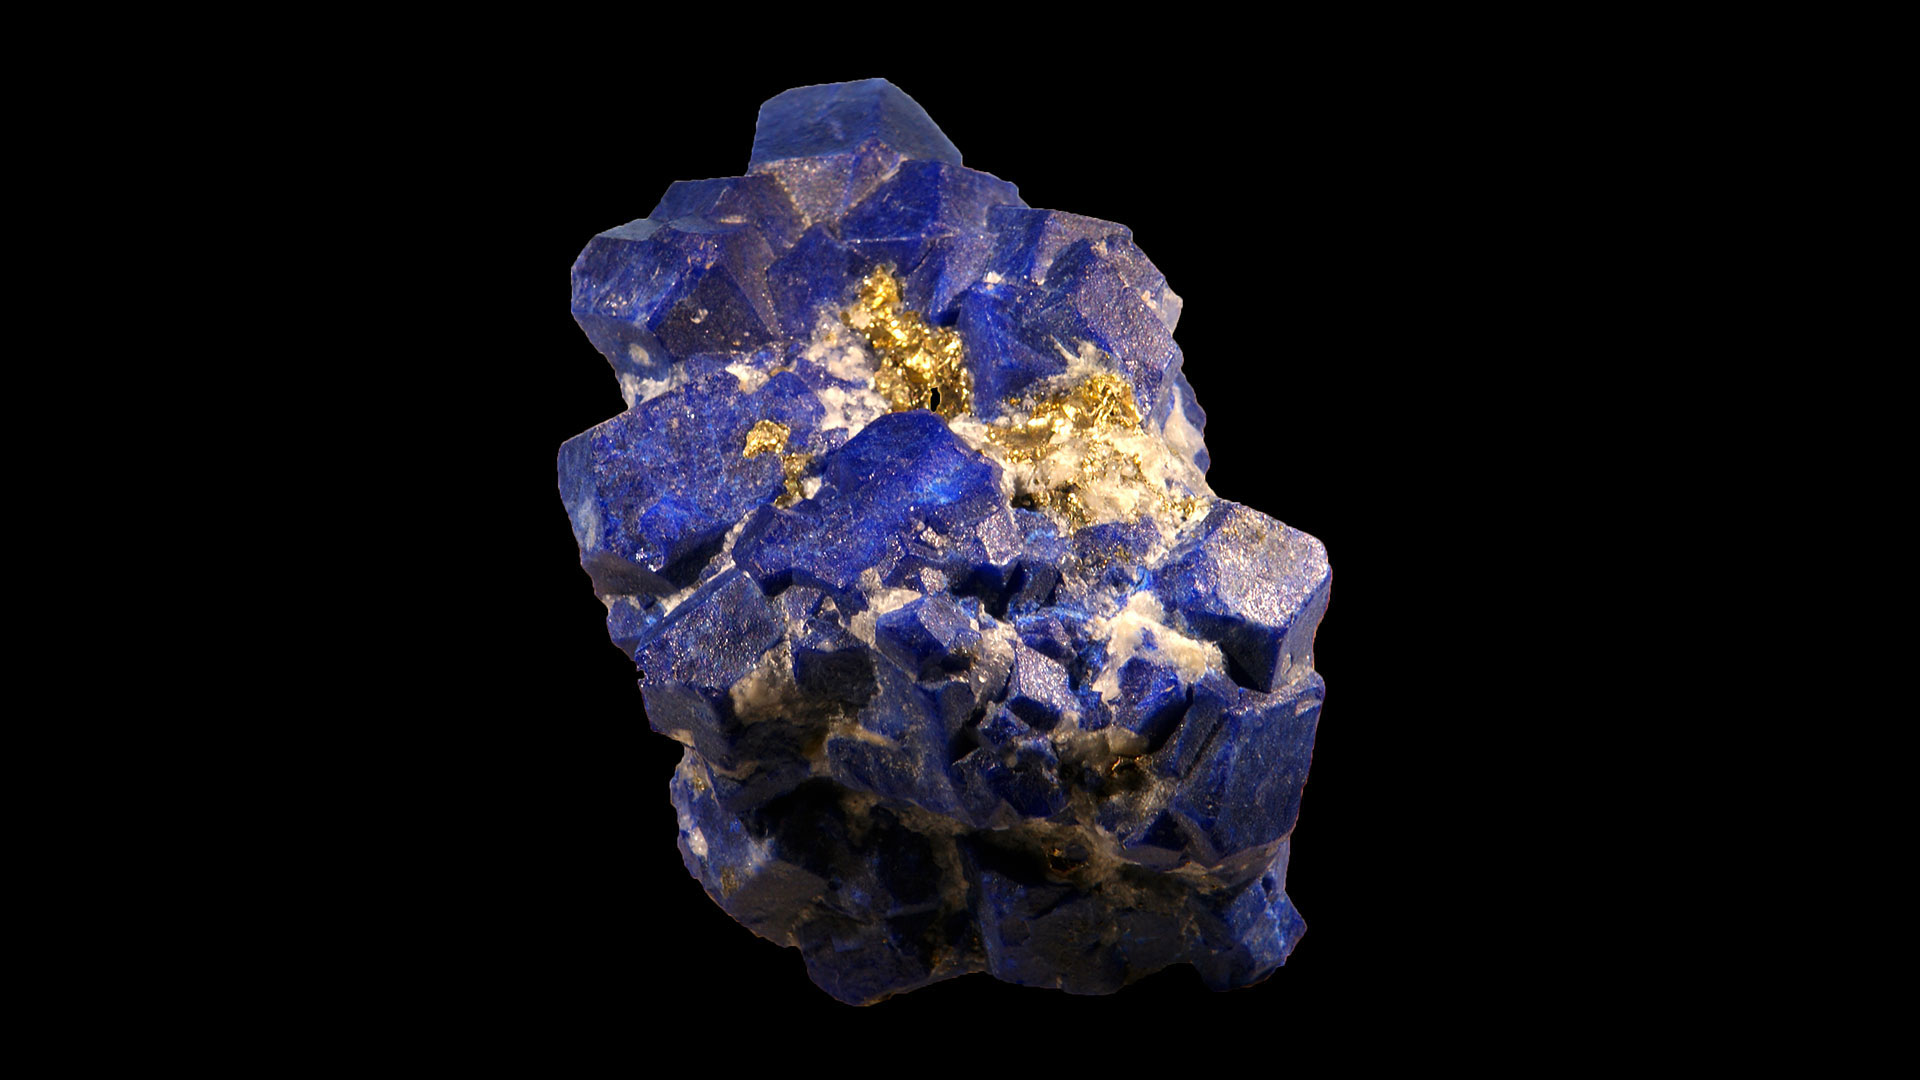 Lapis Specimen - Mineral Specimen - Original photo by Didier Descouens - Modified Background by Crystal Information